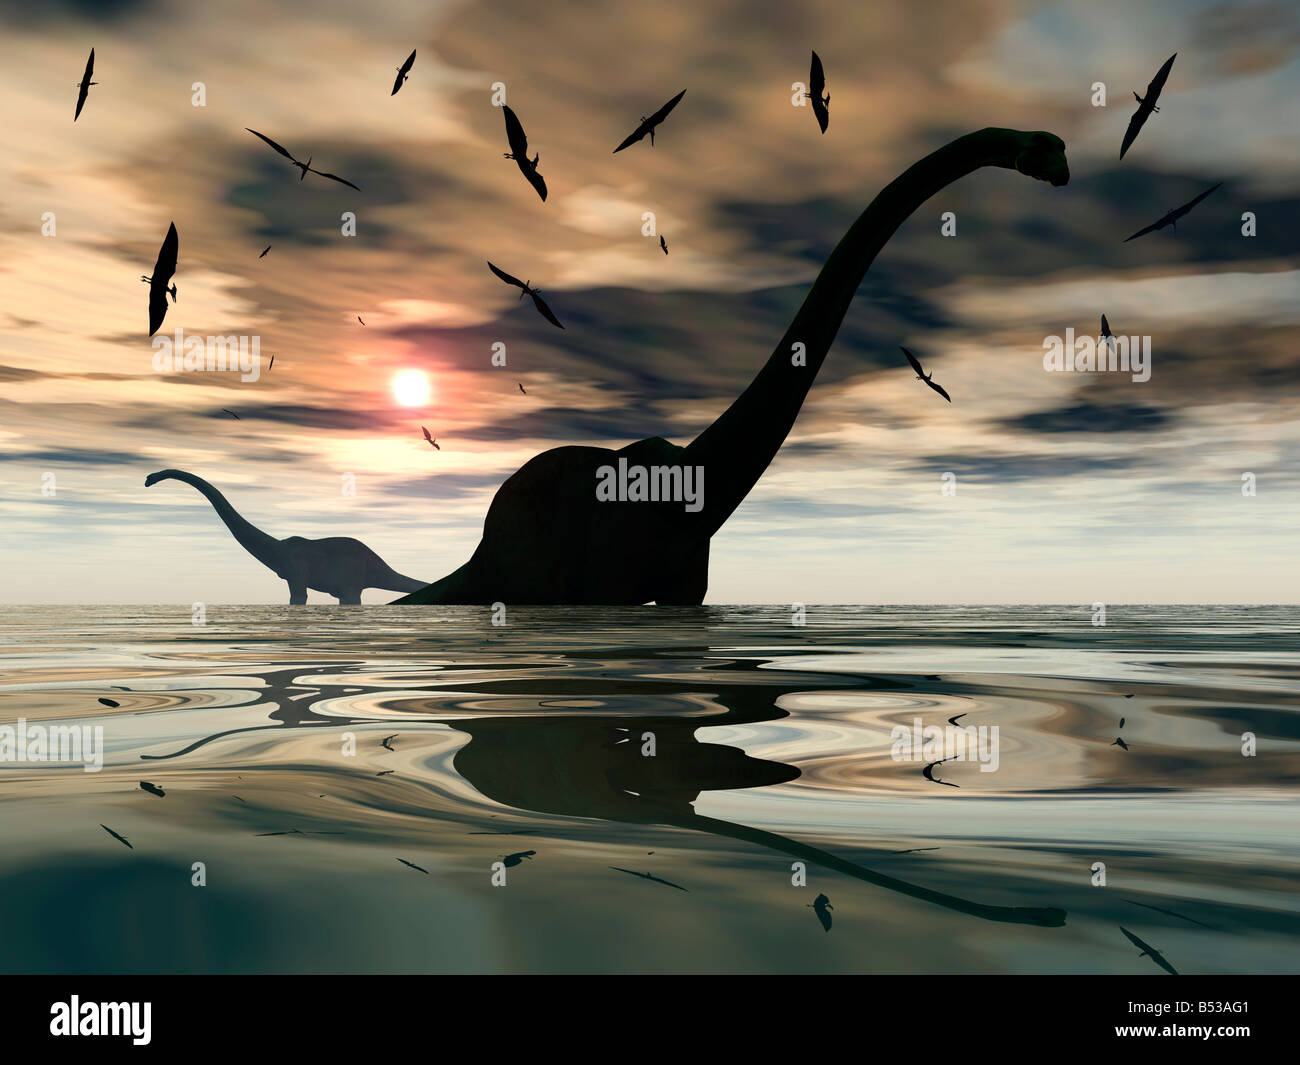 Diplodocus Dinosaurs & Flying Pterosaurs. - Stock Image